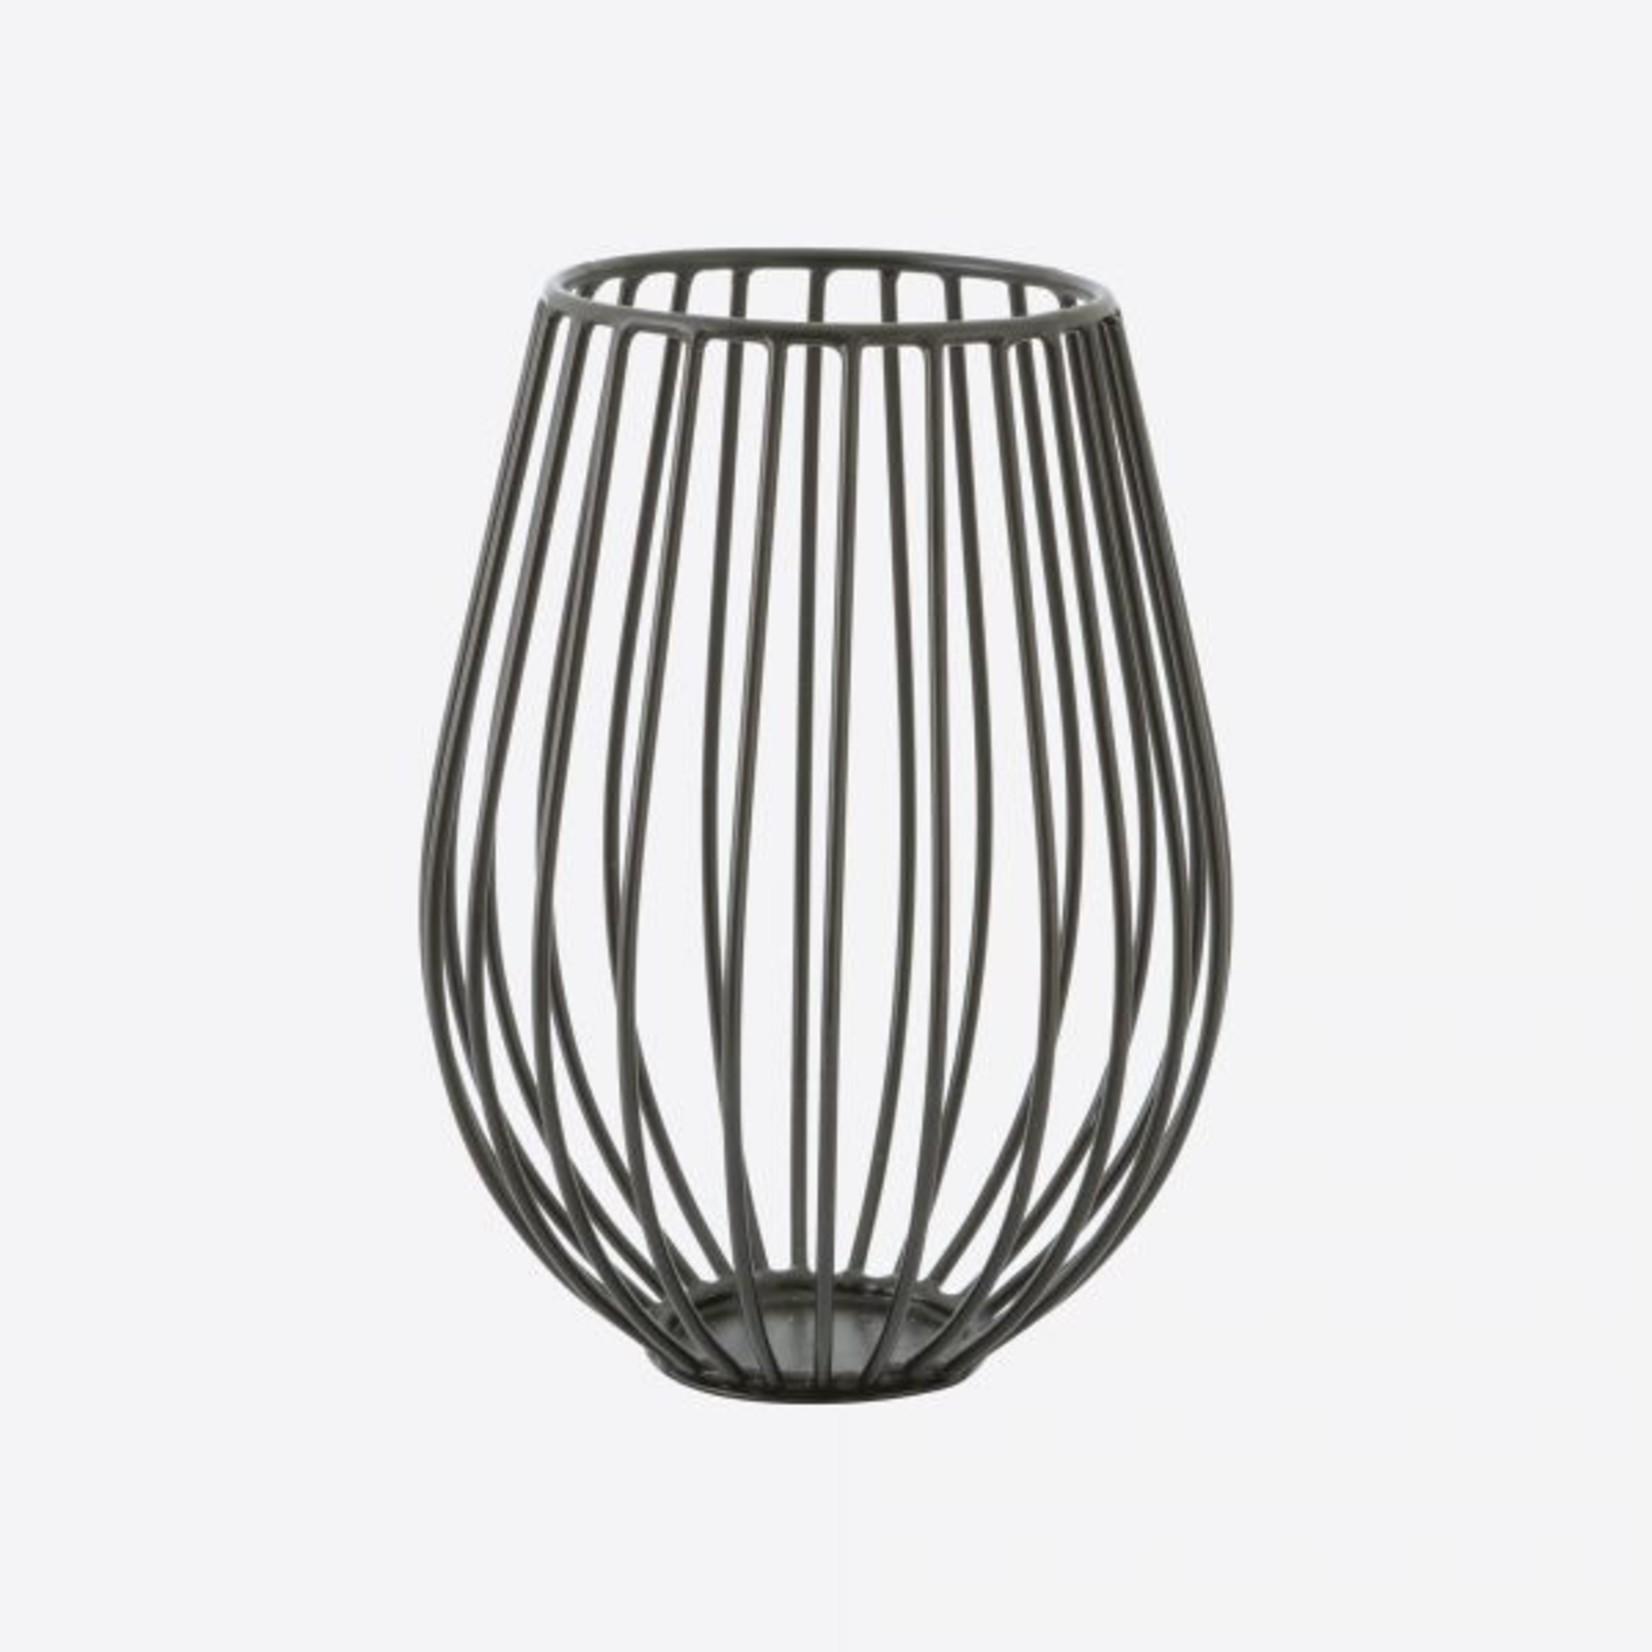 Point Virgule Kaarshouder - Wire - Zwart - Ø 14cm x 18cm